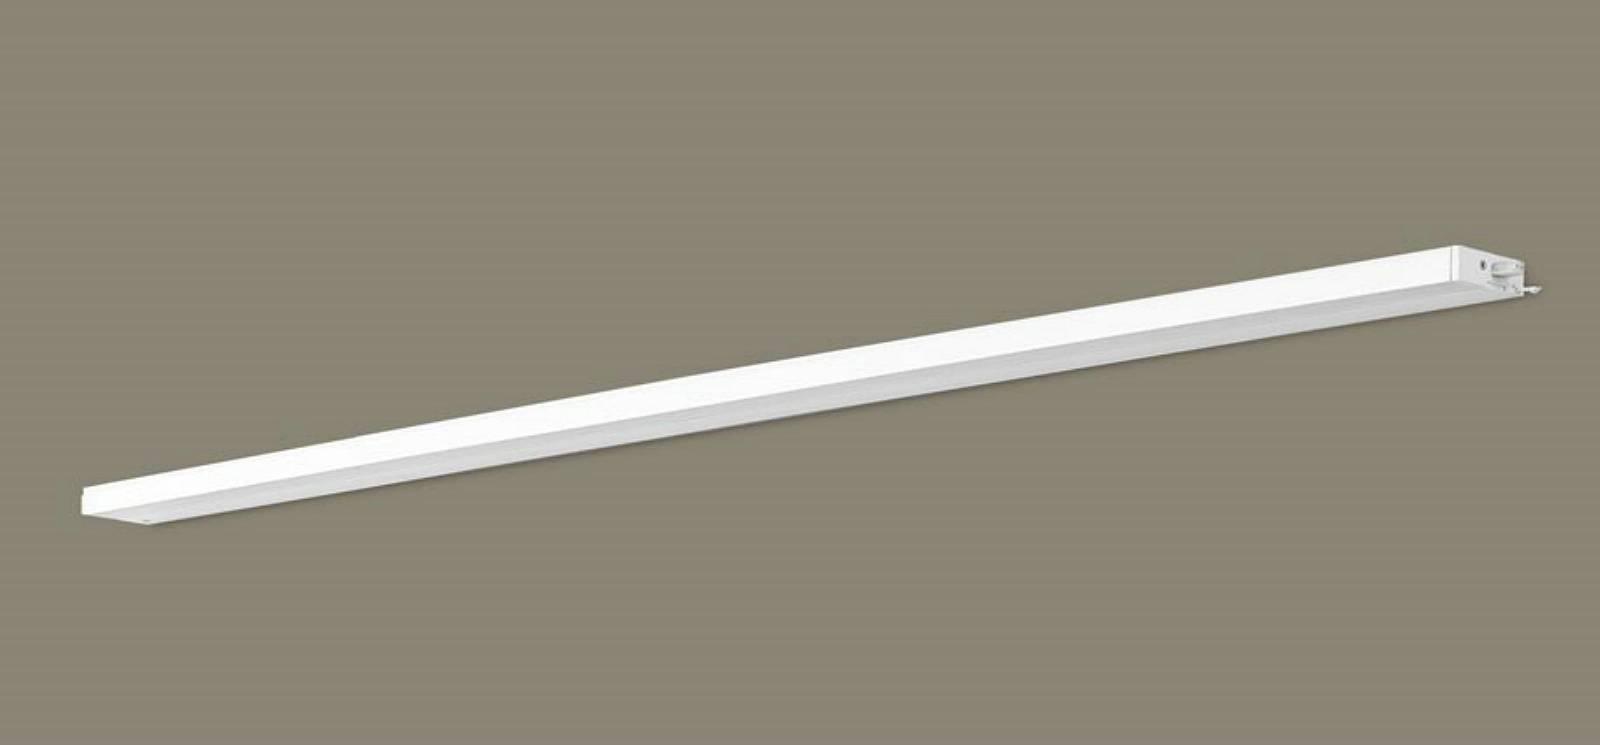 T区分 パナソニック LGB51376XG1 ベースライト 建築化照明器具 単独使用不可 畳数設定無し LED【setsuden_led】